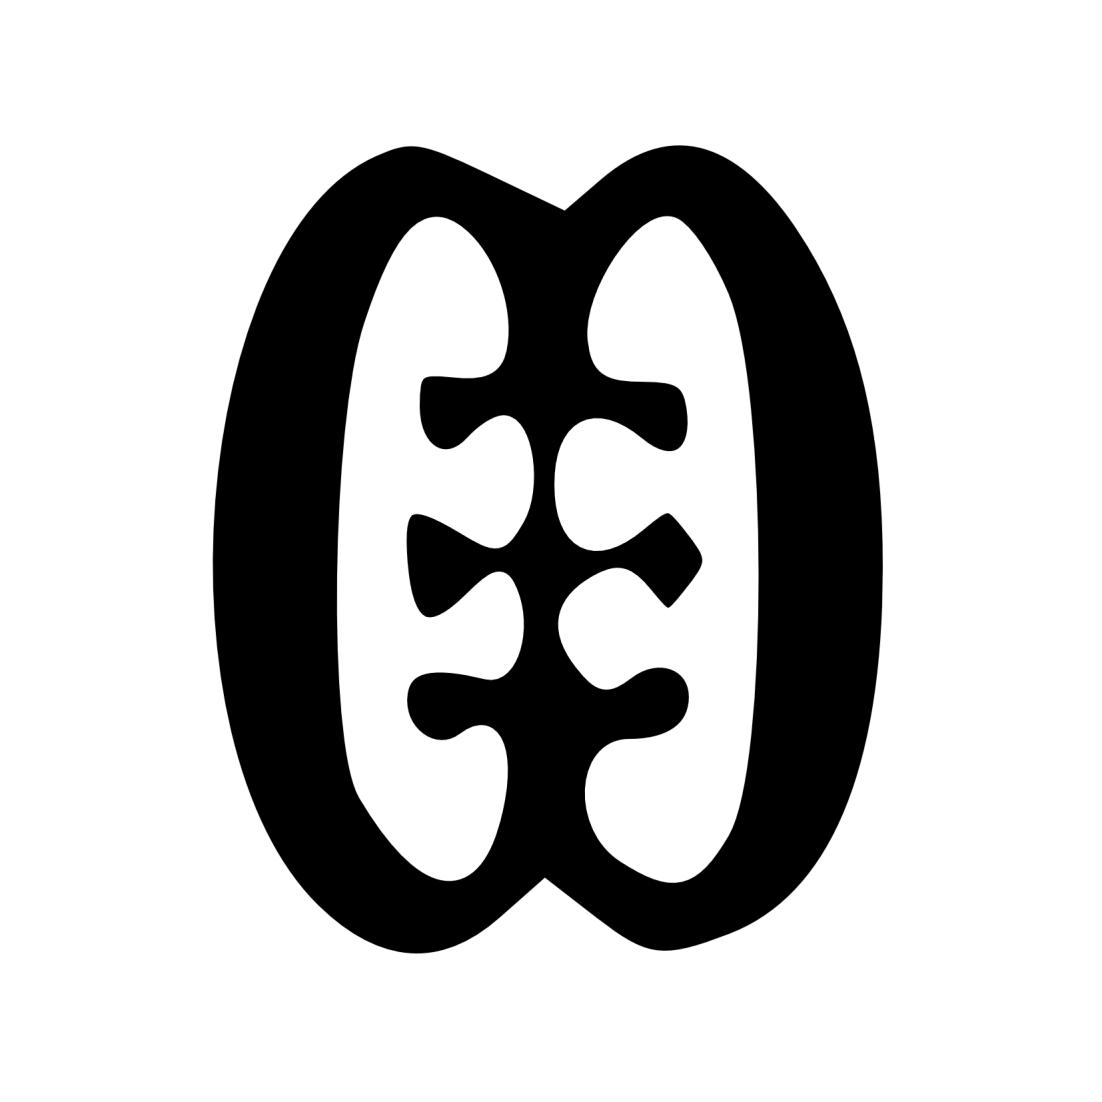 Ese ne tekrema adinkra symbol for friendship tongue and teeth ese ne tekrema adinkra symbol for friendship tongue and teeth biocorpaavc Images